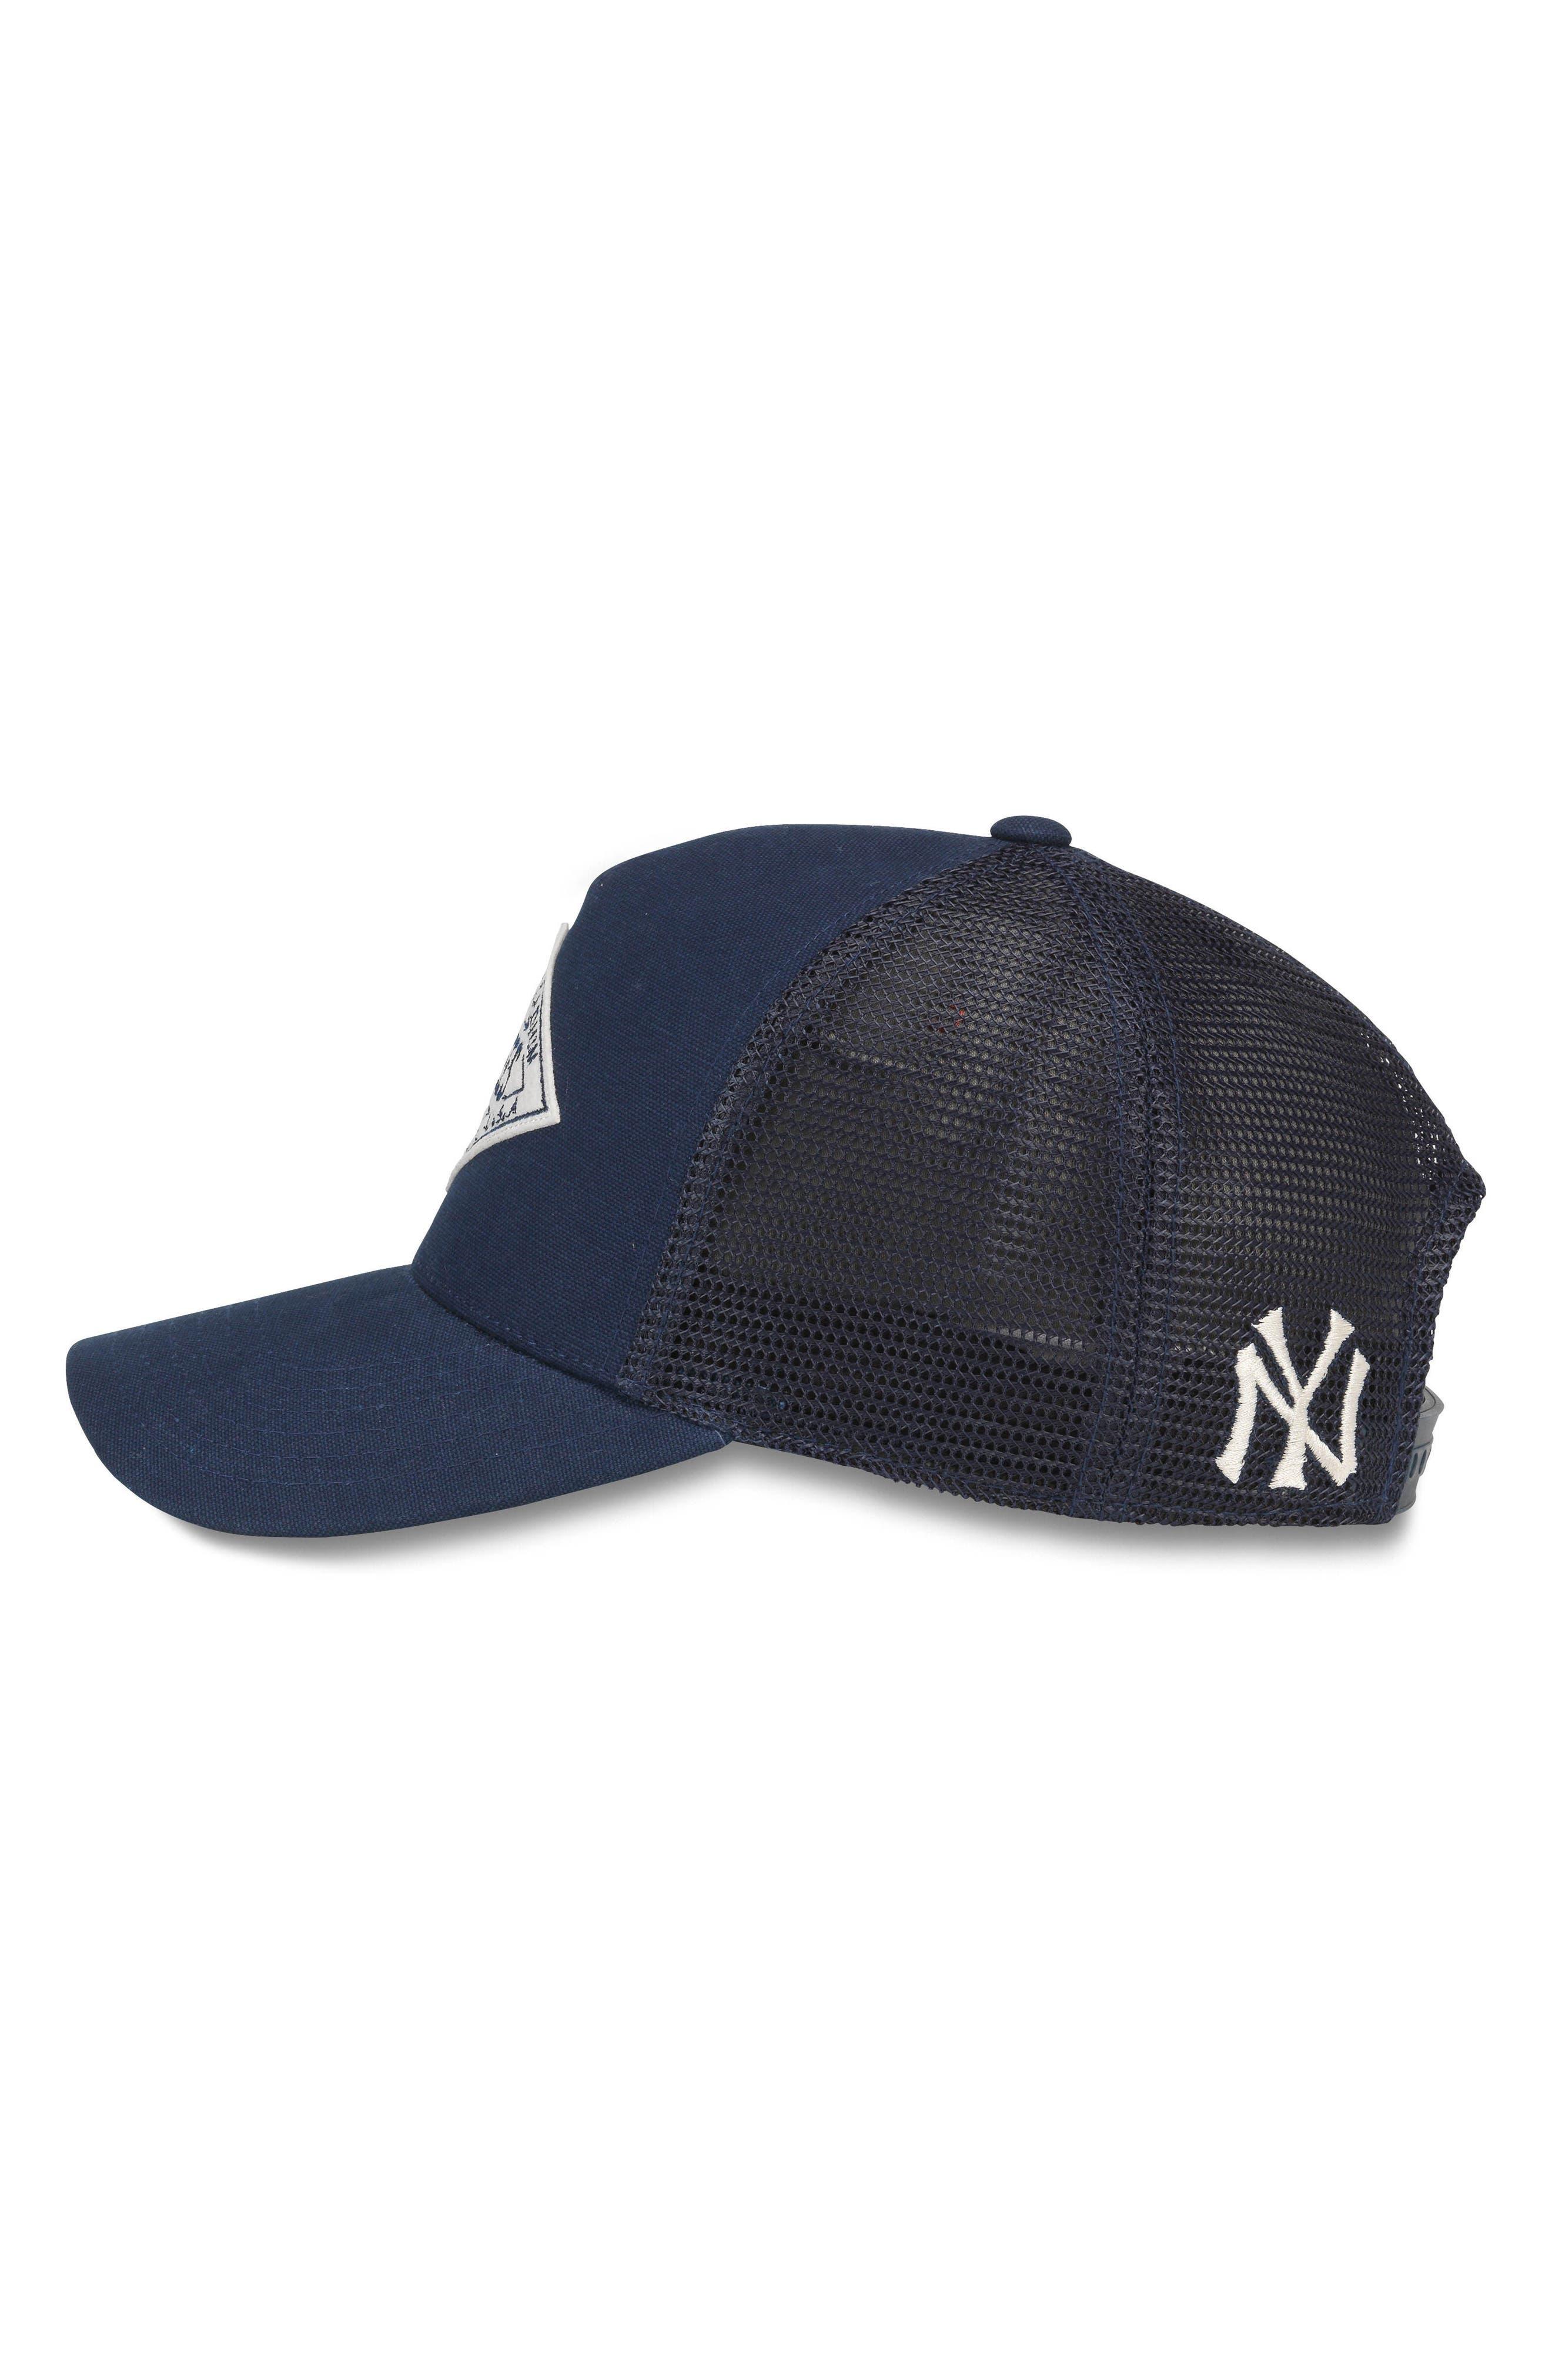 Valin MLB Trucker Hat,                             Alternate thumbnail 2, color,                             Yankees